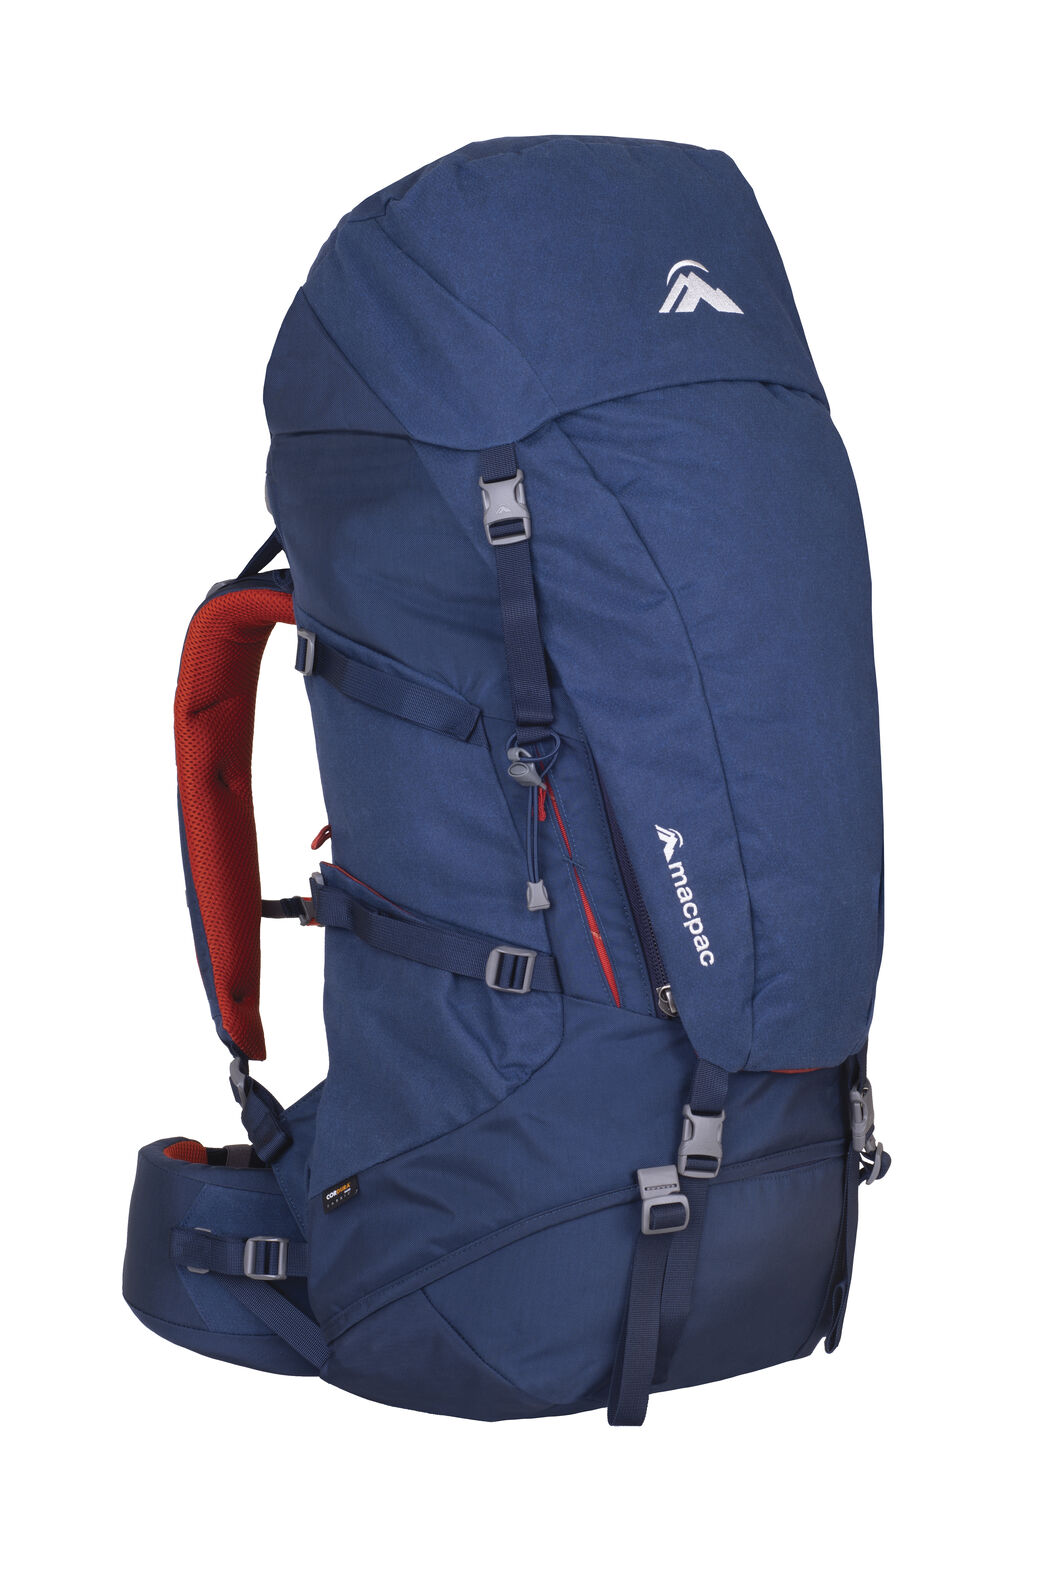 Macpac Torlesse 65L AzTec® Zip Hiking Pack, Black Iris, hi-res